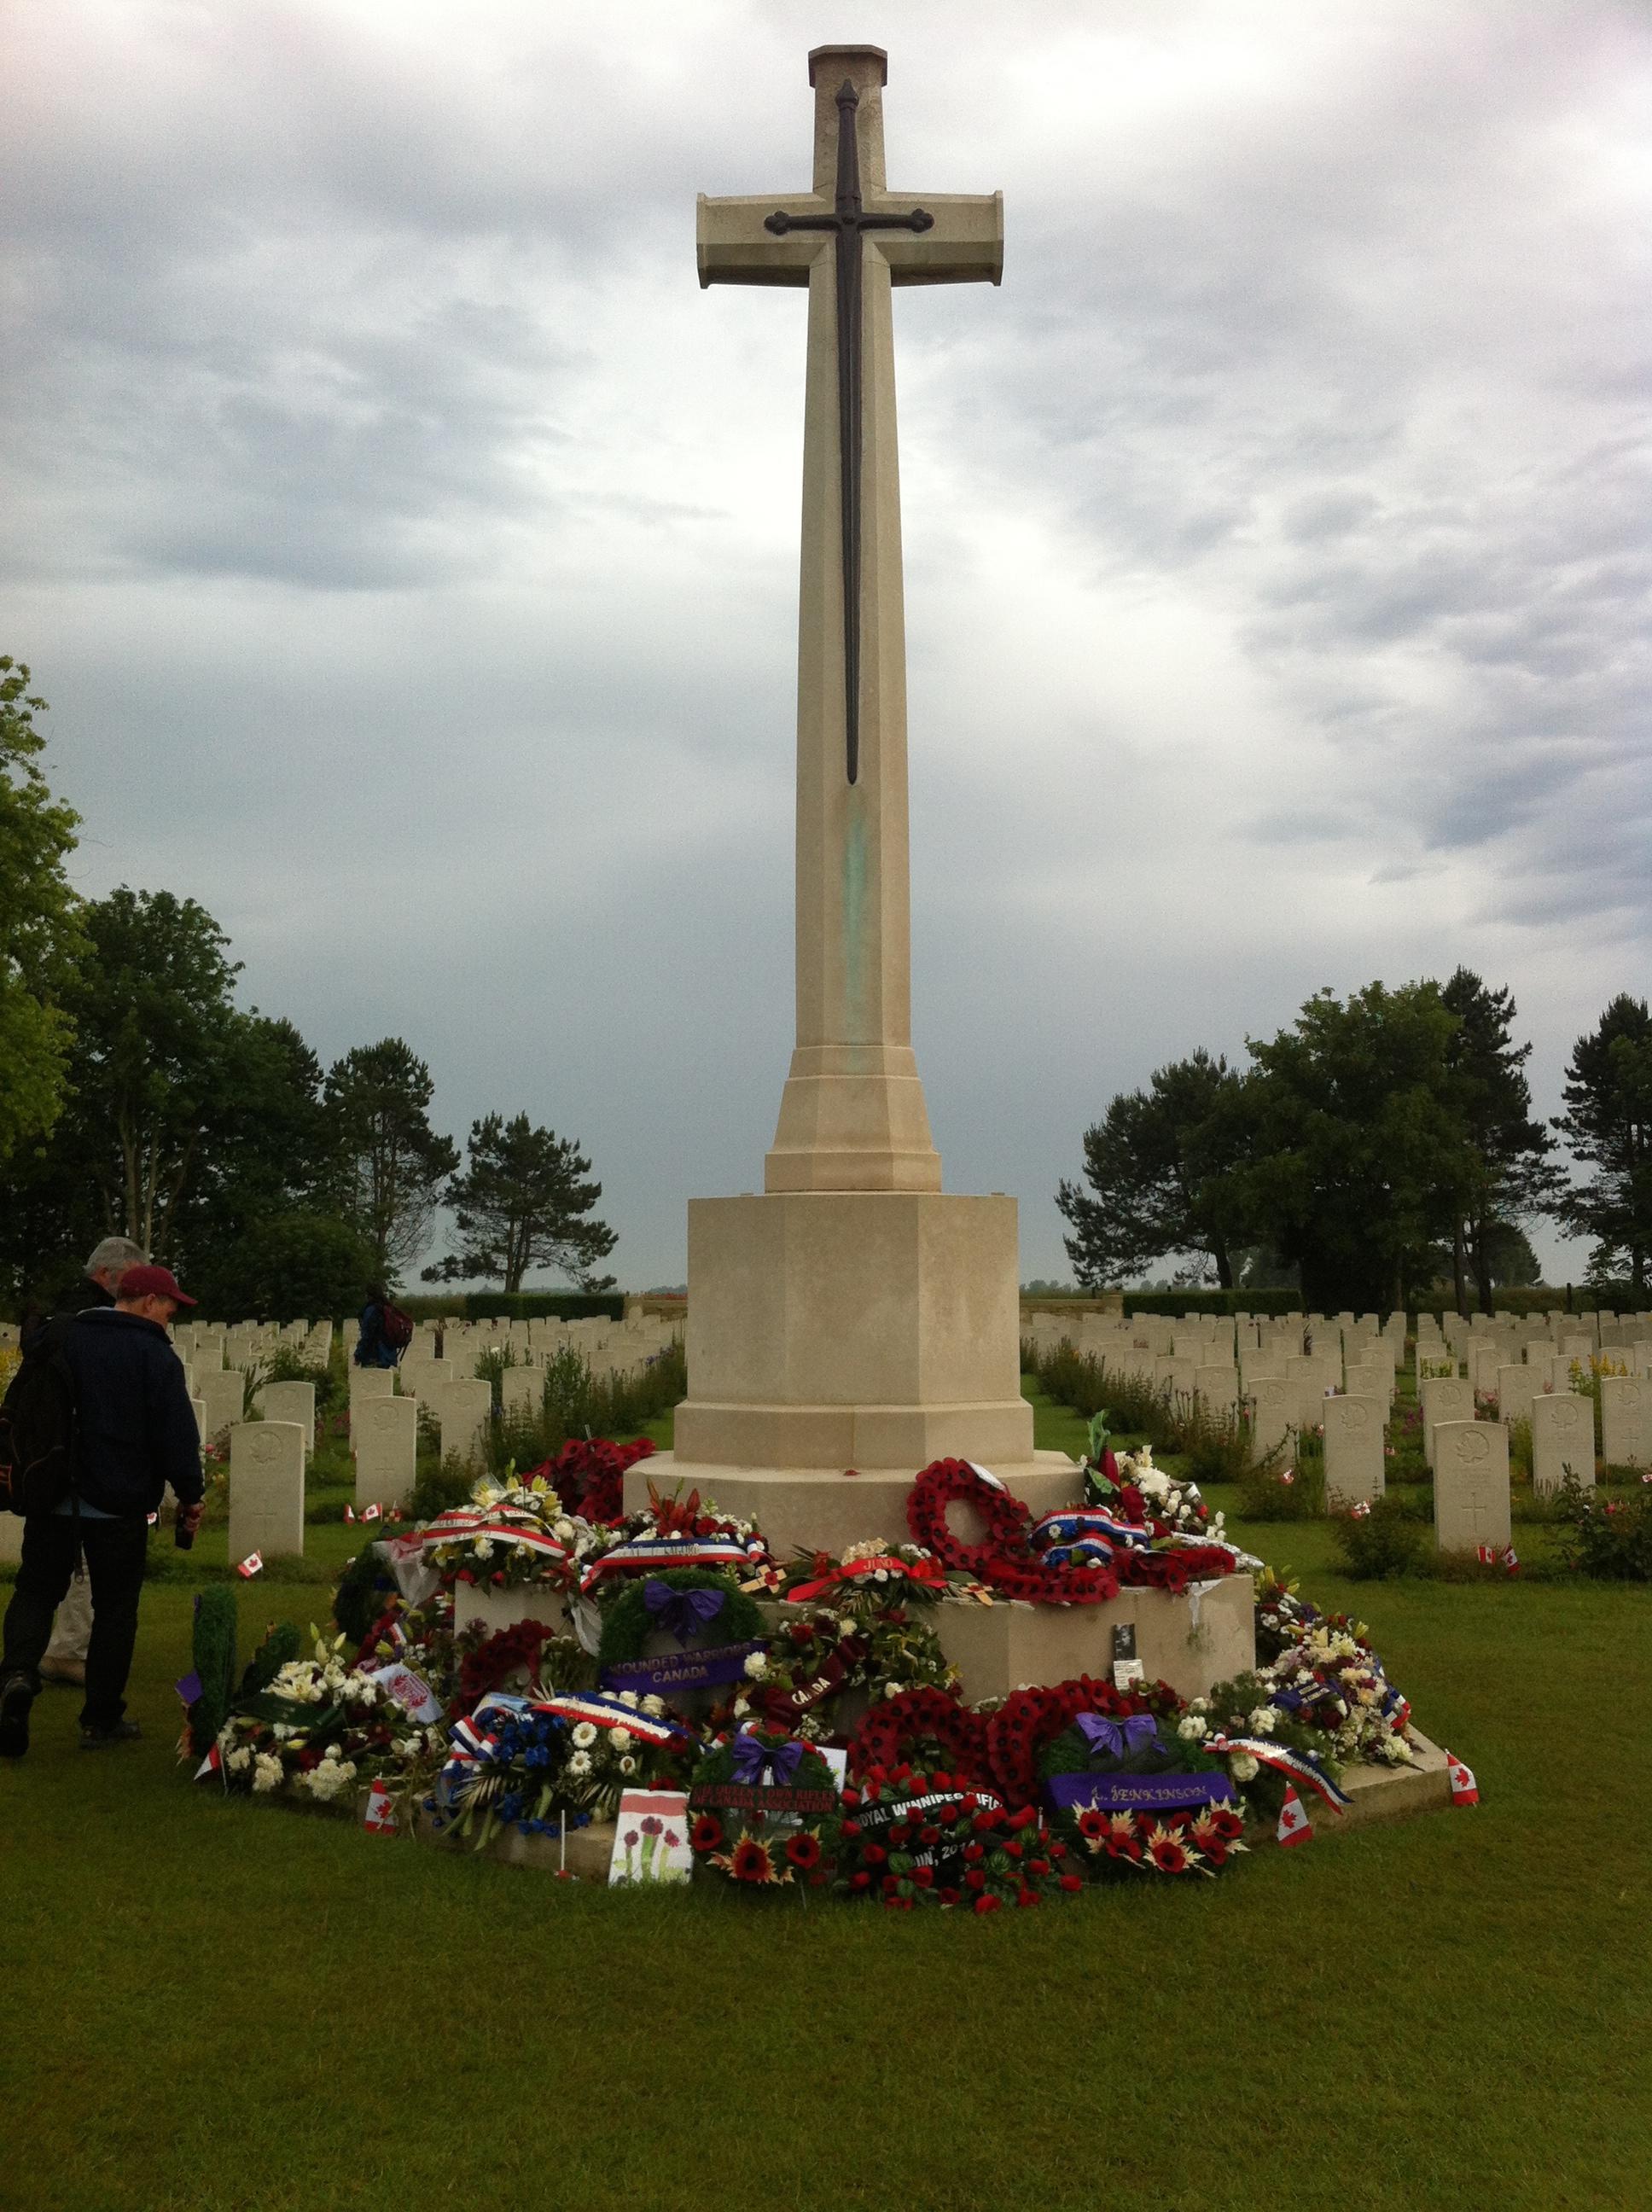 Beny-sur-mer-cemetery 2